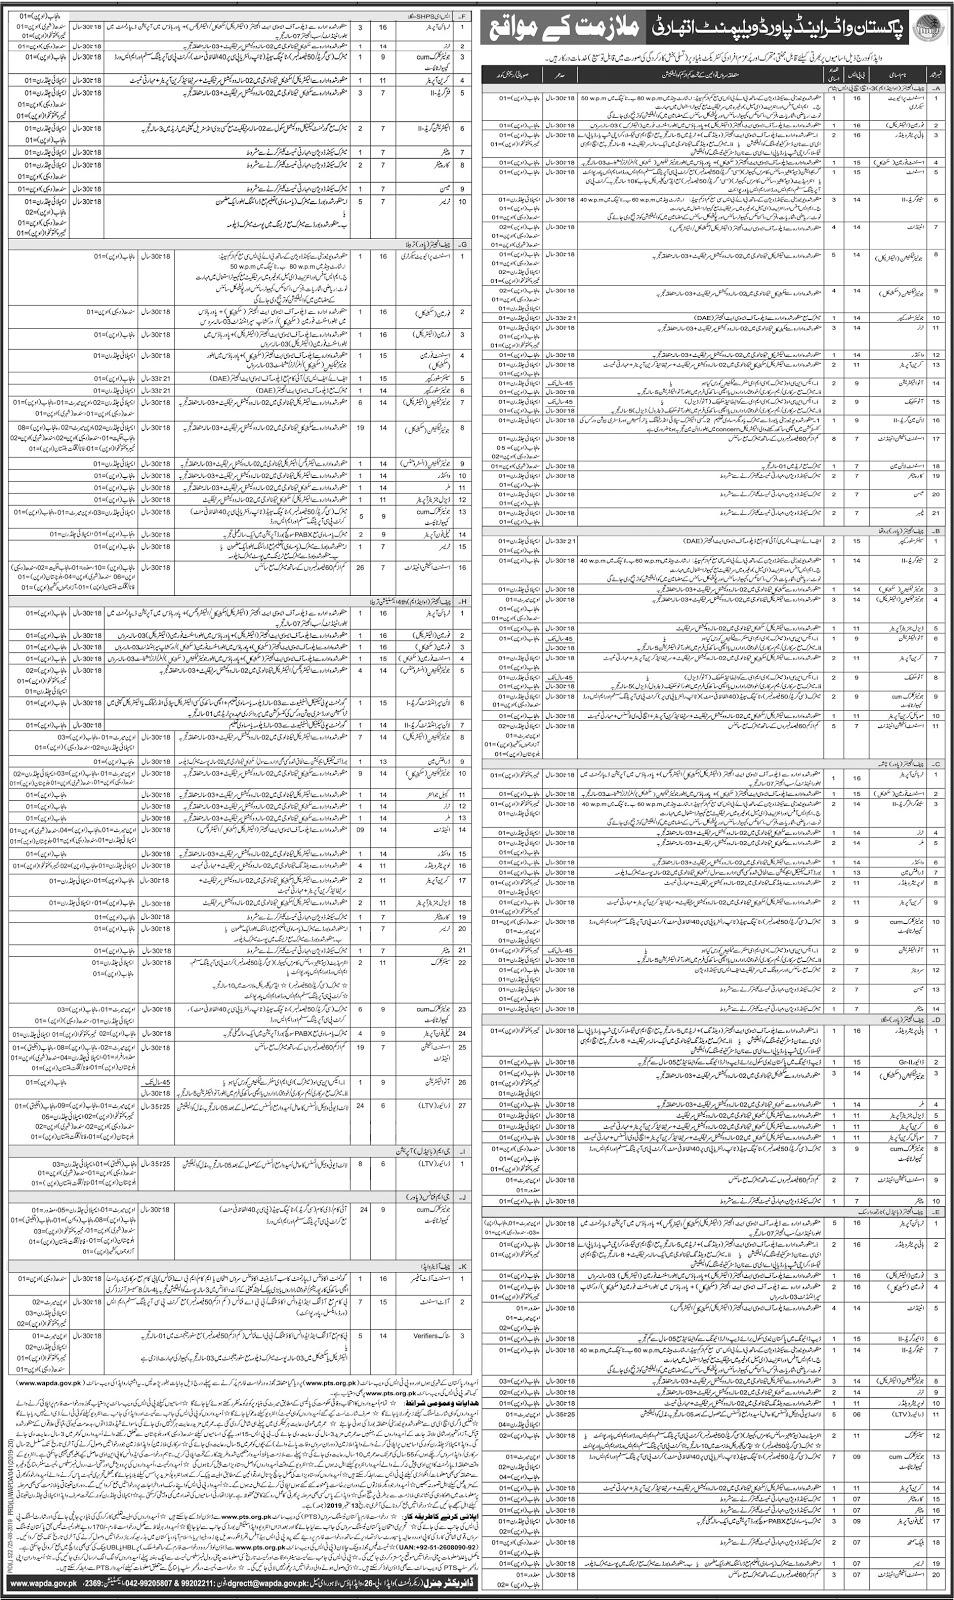 Pakistan Water and Power Development Authority WAPDA Jobs 2019